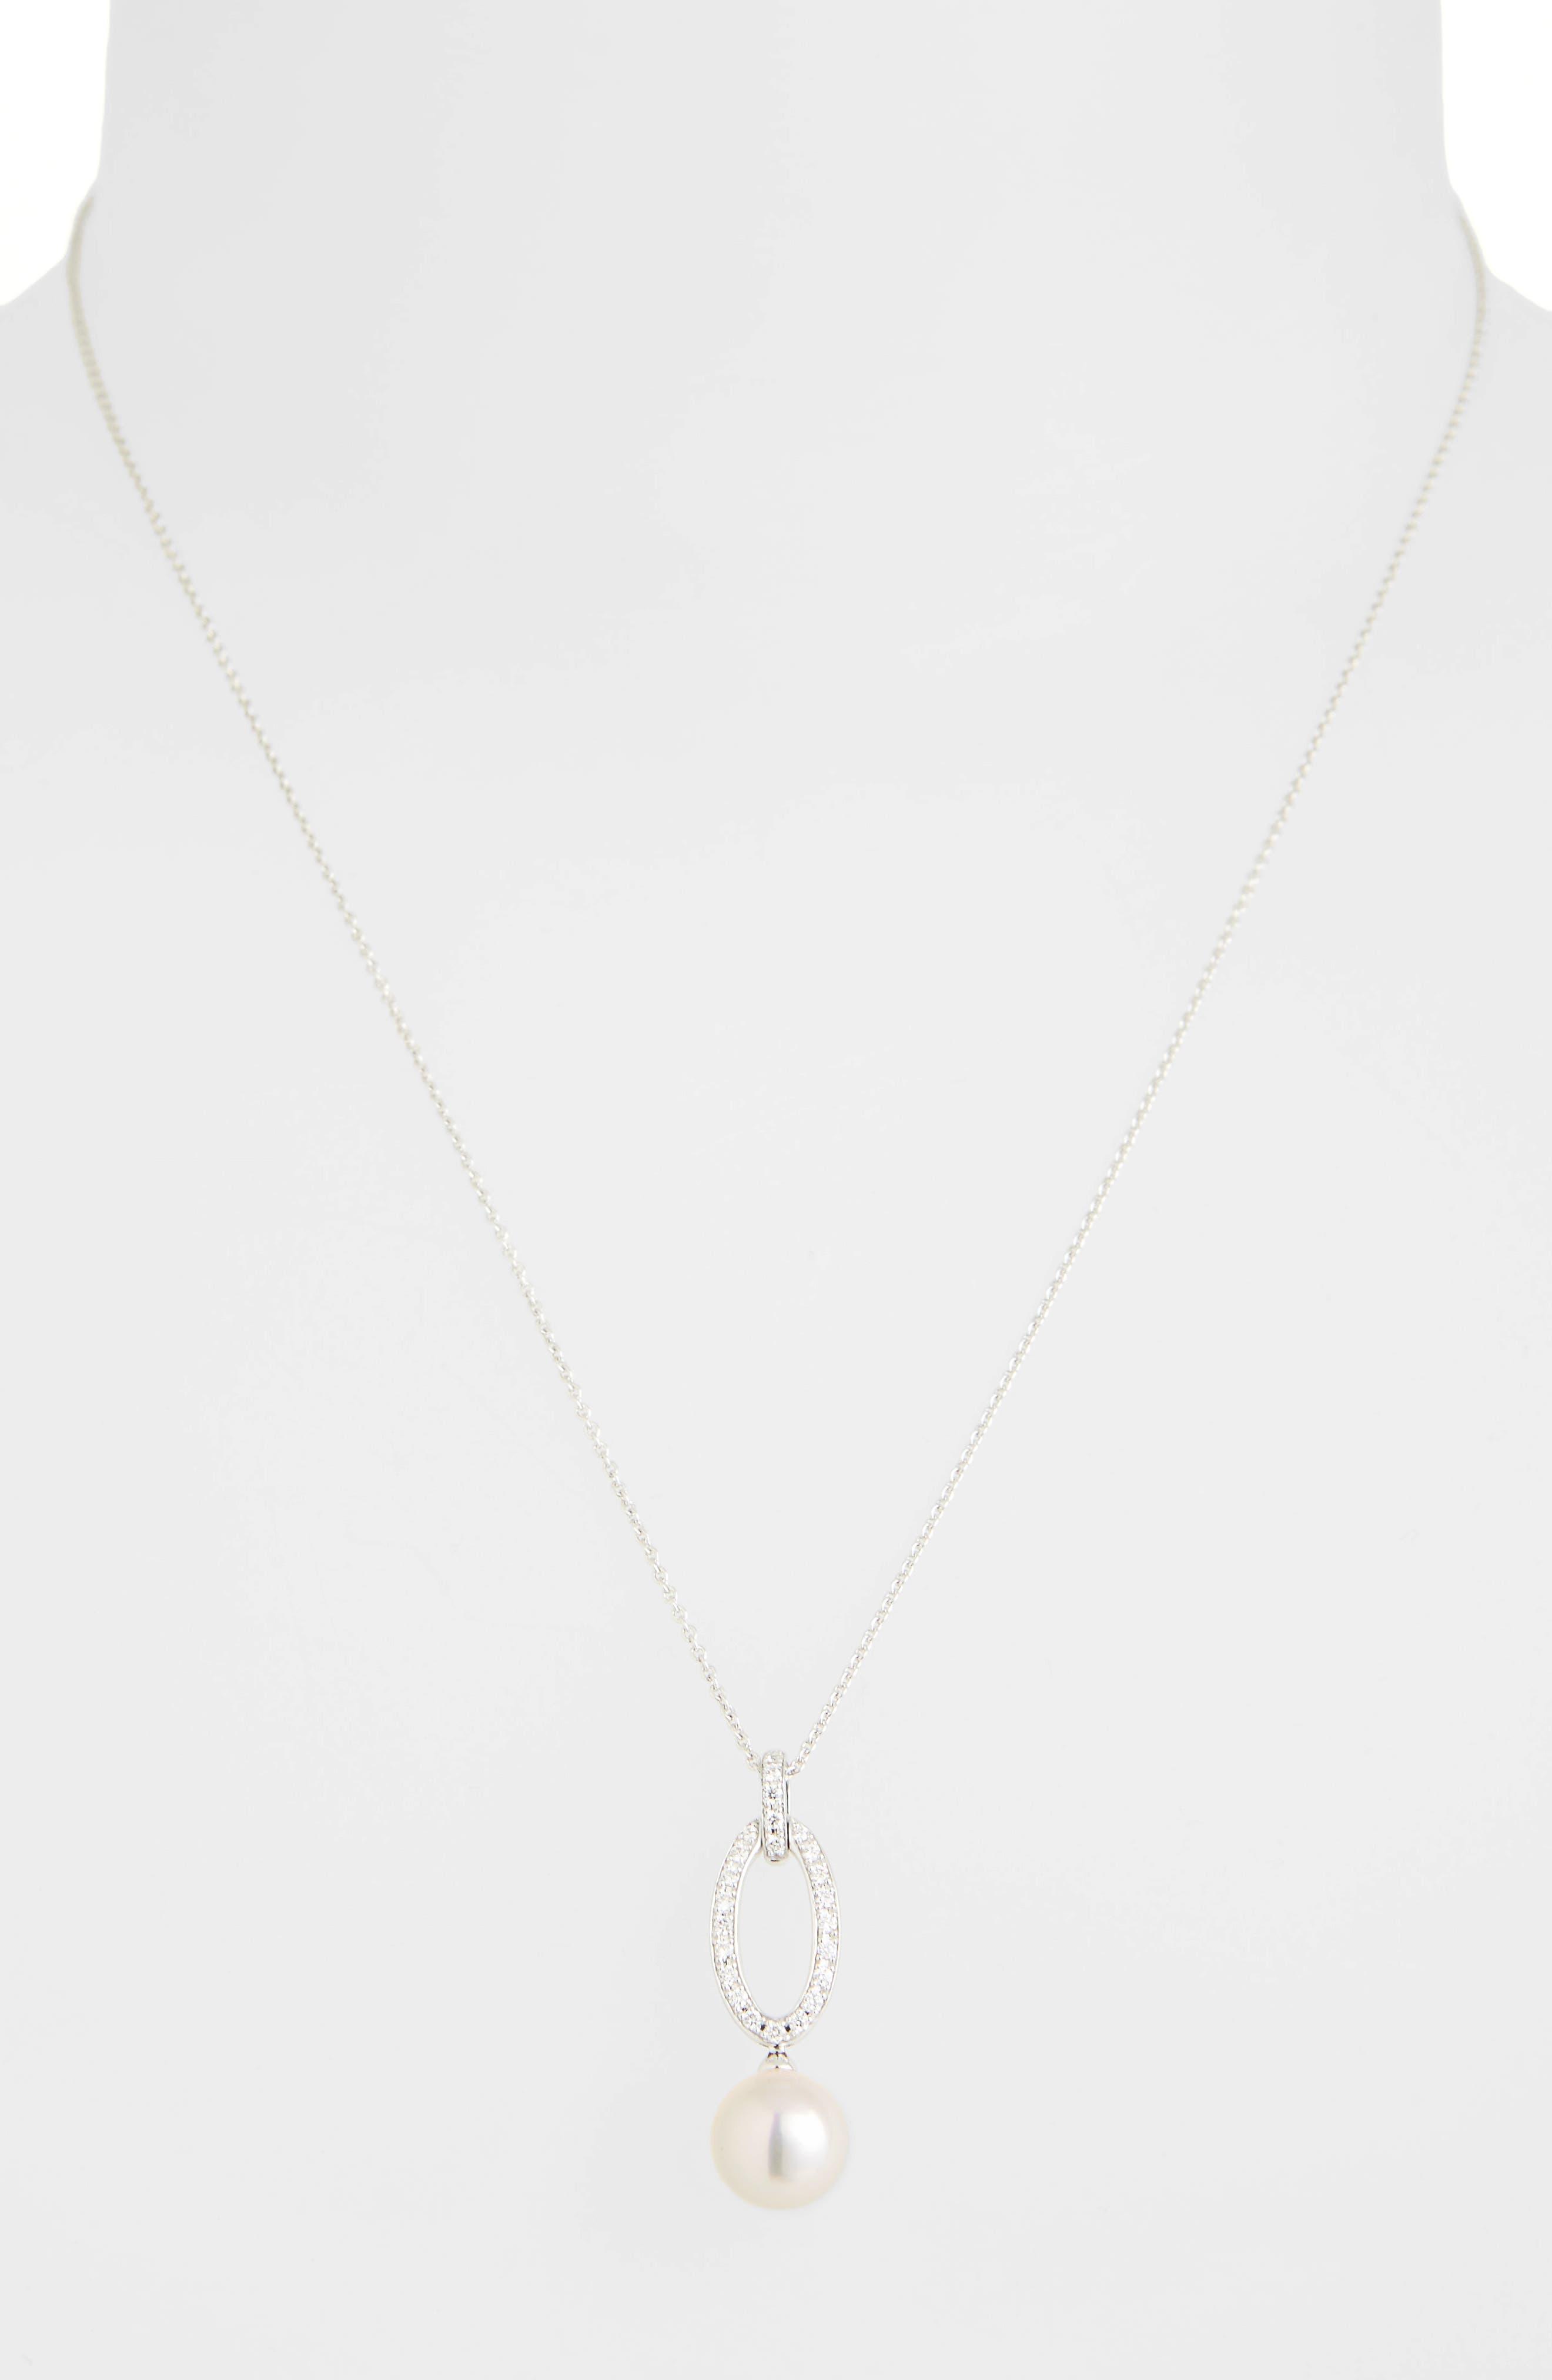 Diamond & Akoya Cultured Pearl Pendant Necklace,                             Alternate thumbnail 2, color,                             WHITE GOLD